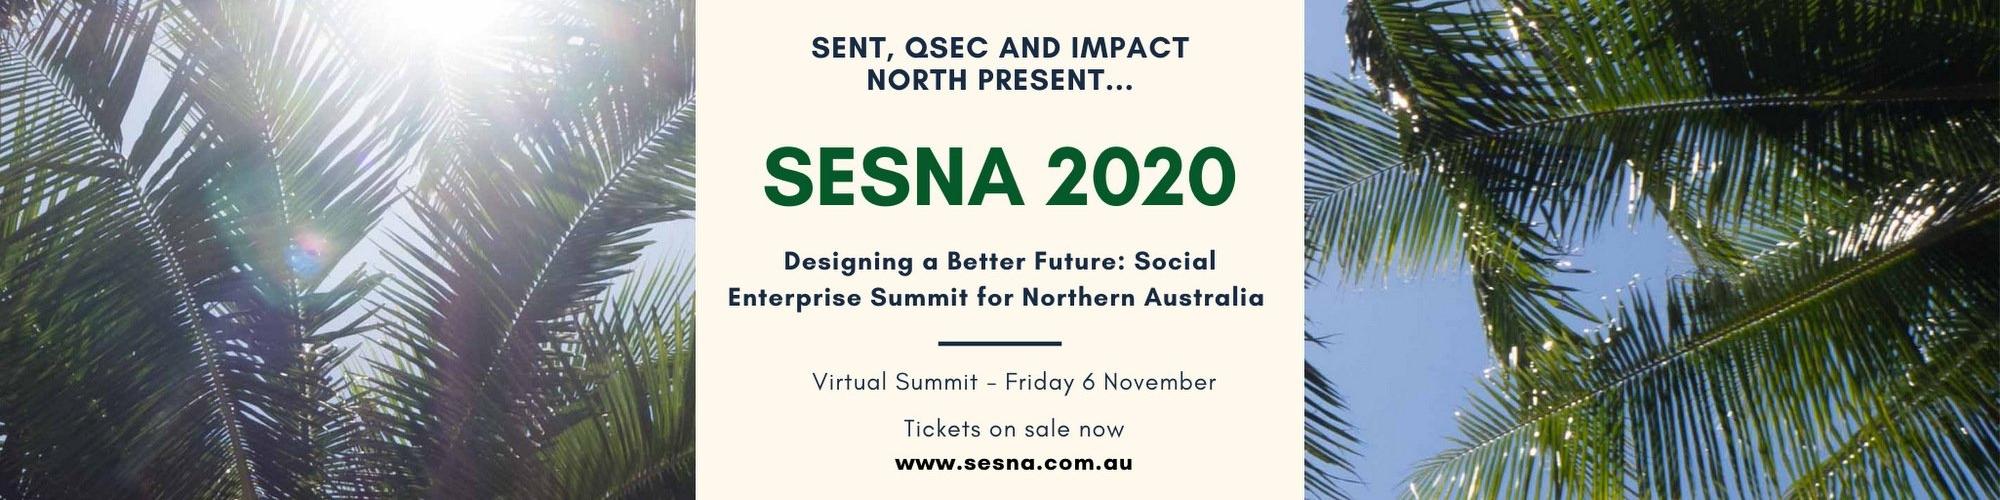 SESNA 2020 - QLD